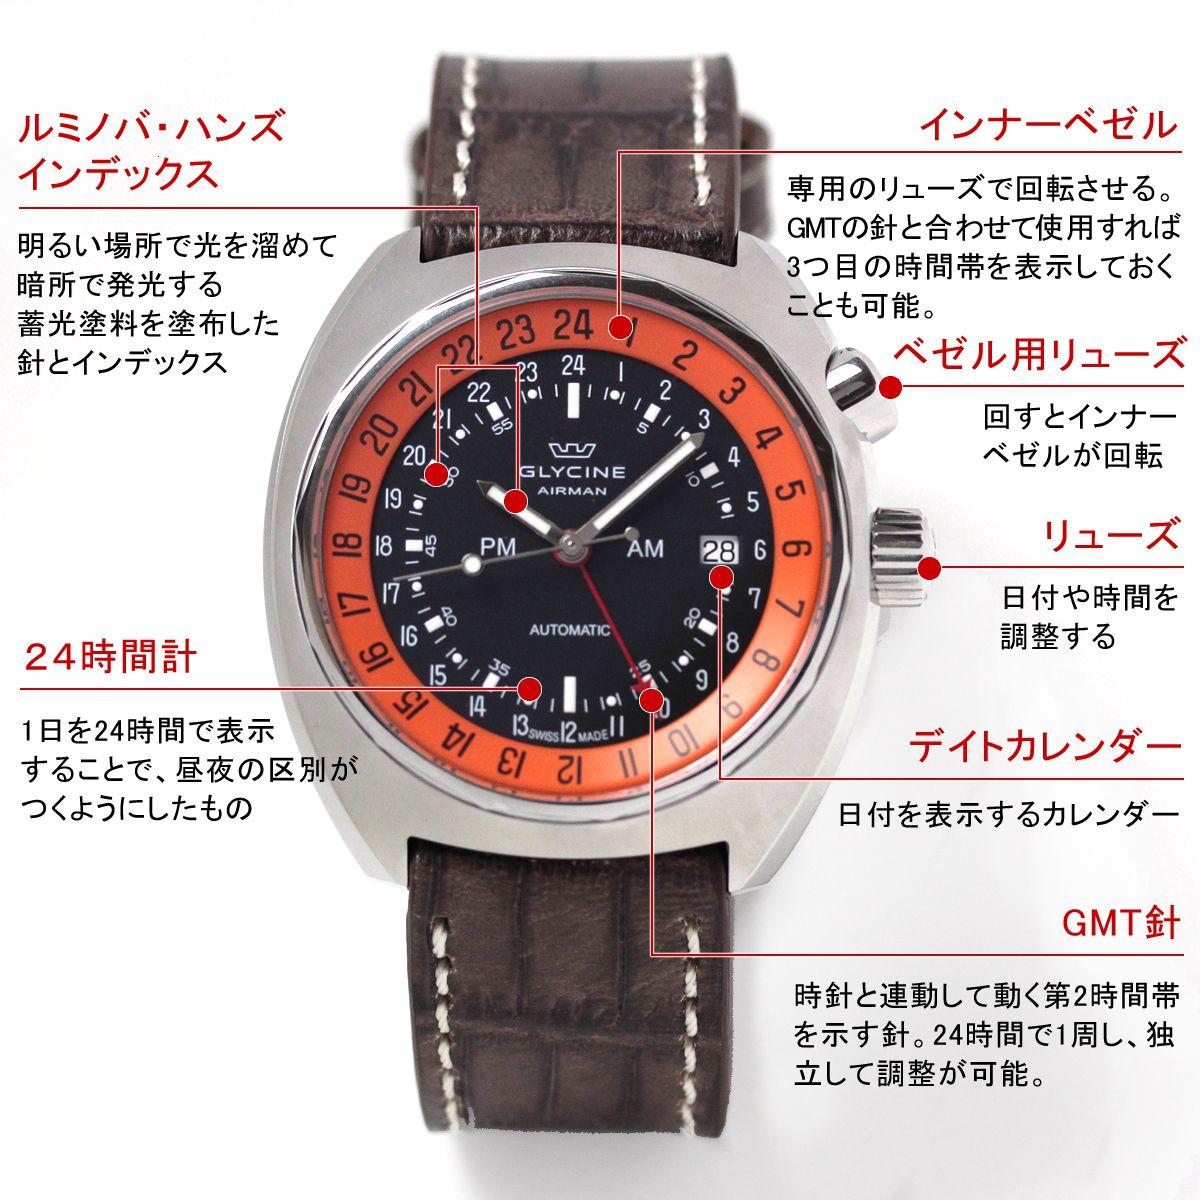 GLYCINE(グライシン) 腕時計 機能説明・詳細